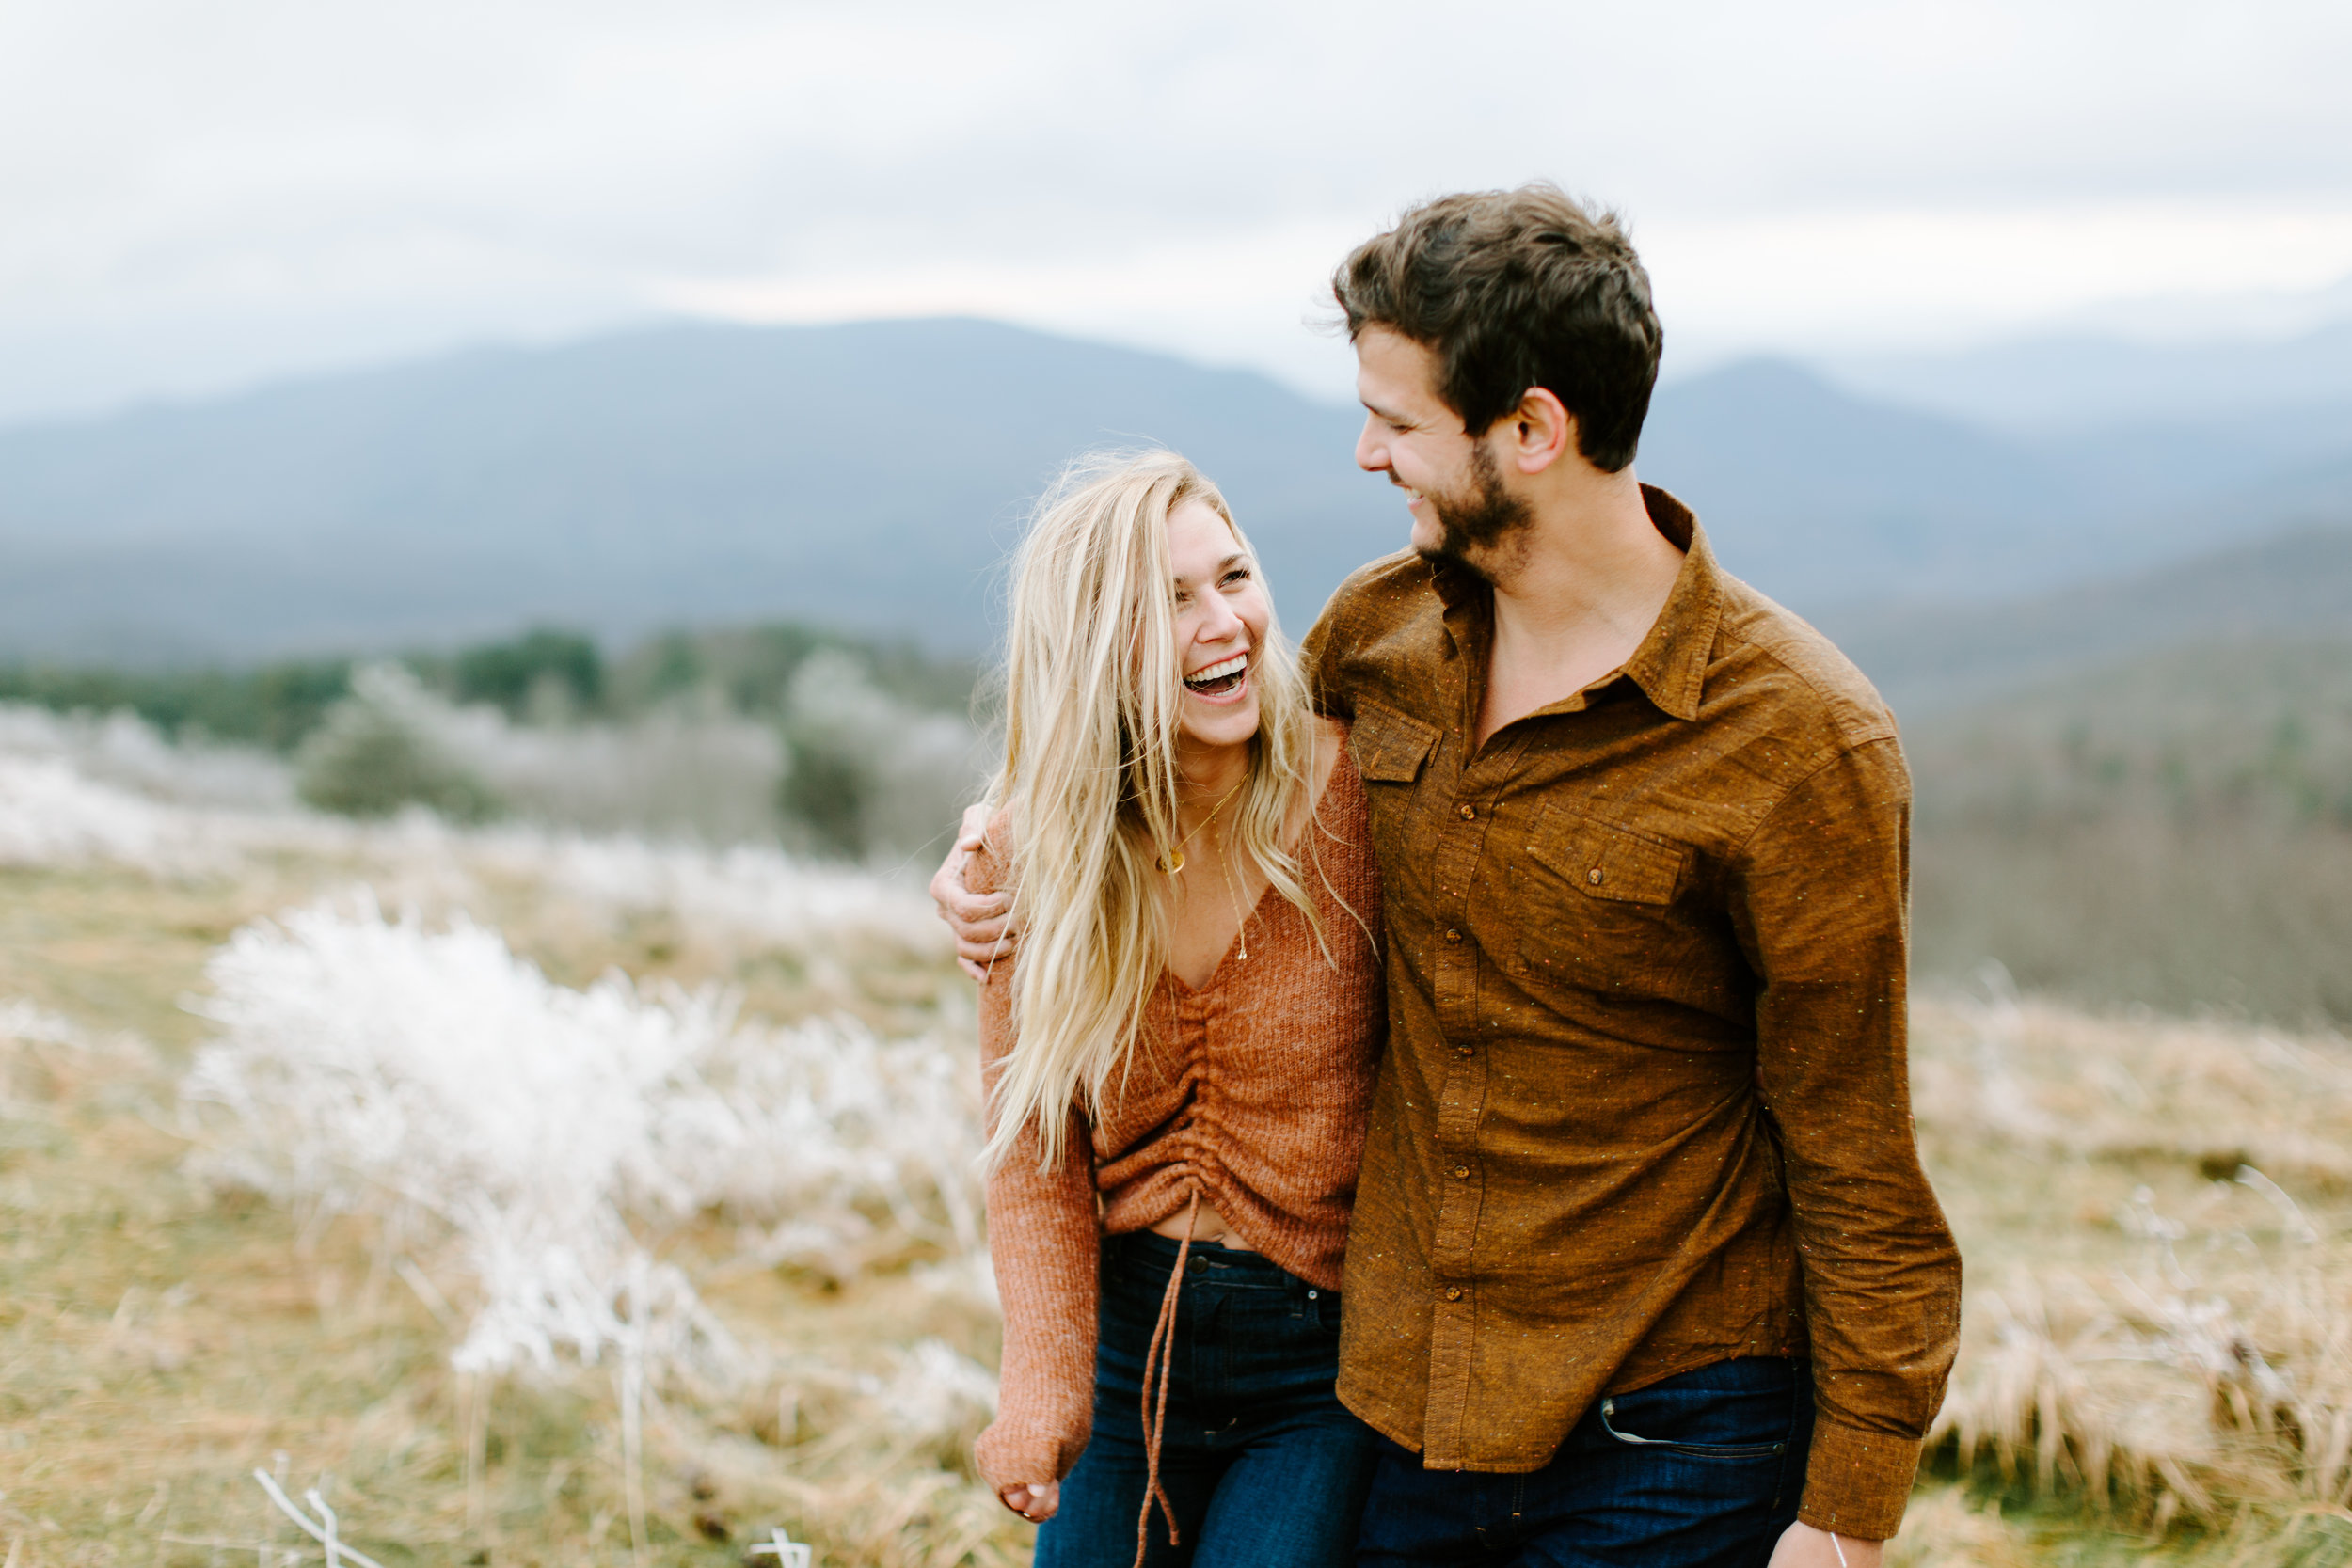 happy couple on mountain